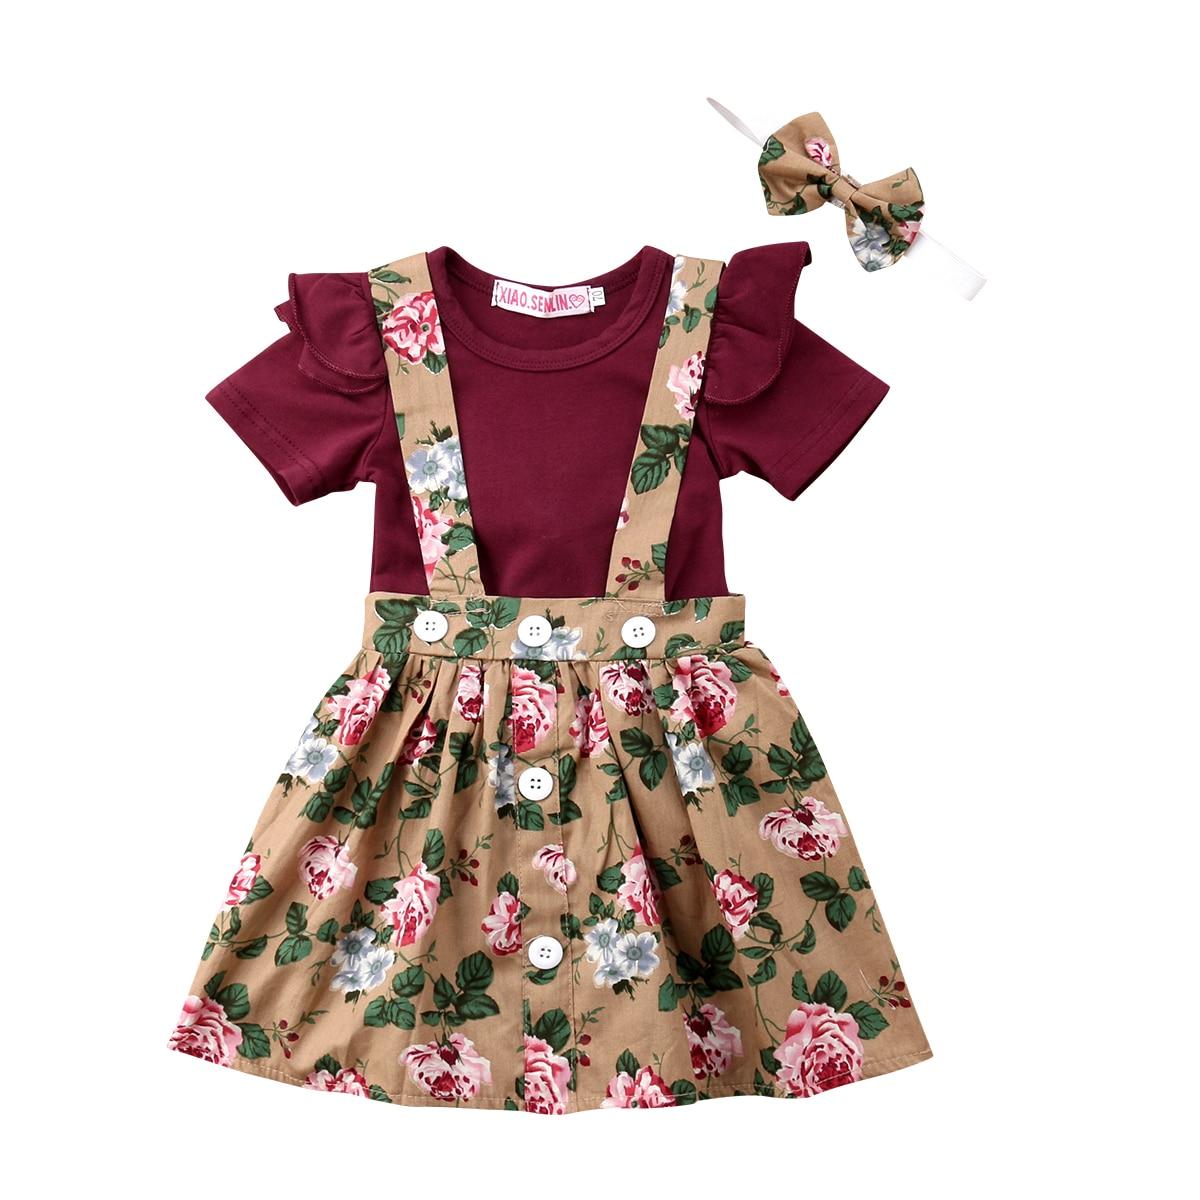 a77899eed2c6 Cute Newborn Baby Girl Summer Clothes Ruffles Short Sleeve Cotton Romper  Tops+Floral Bib Dress